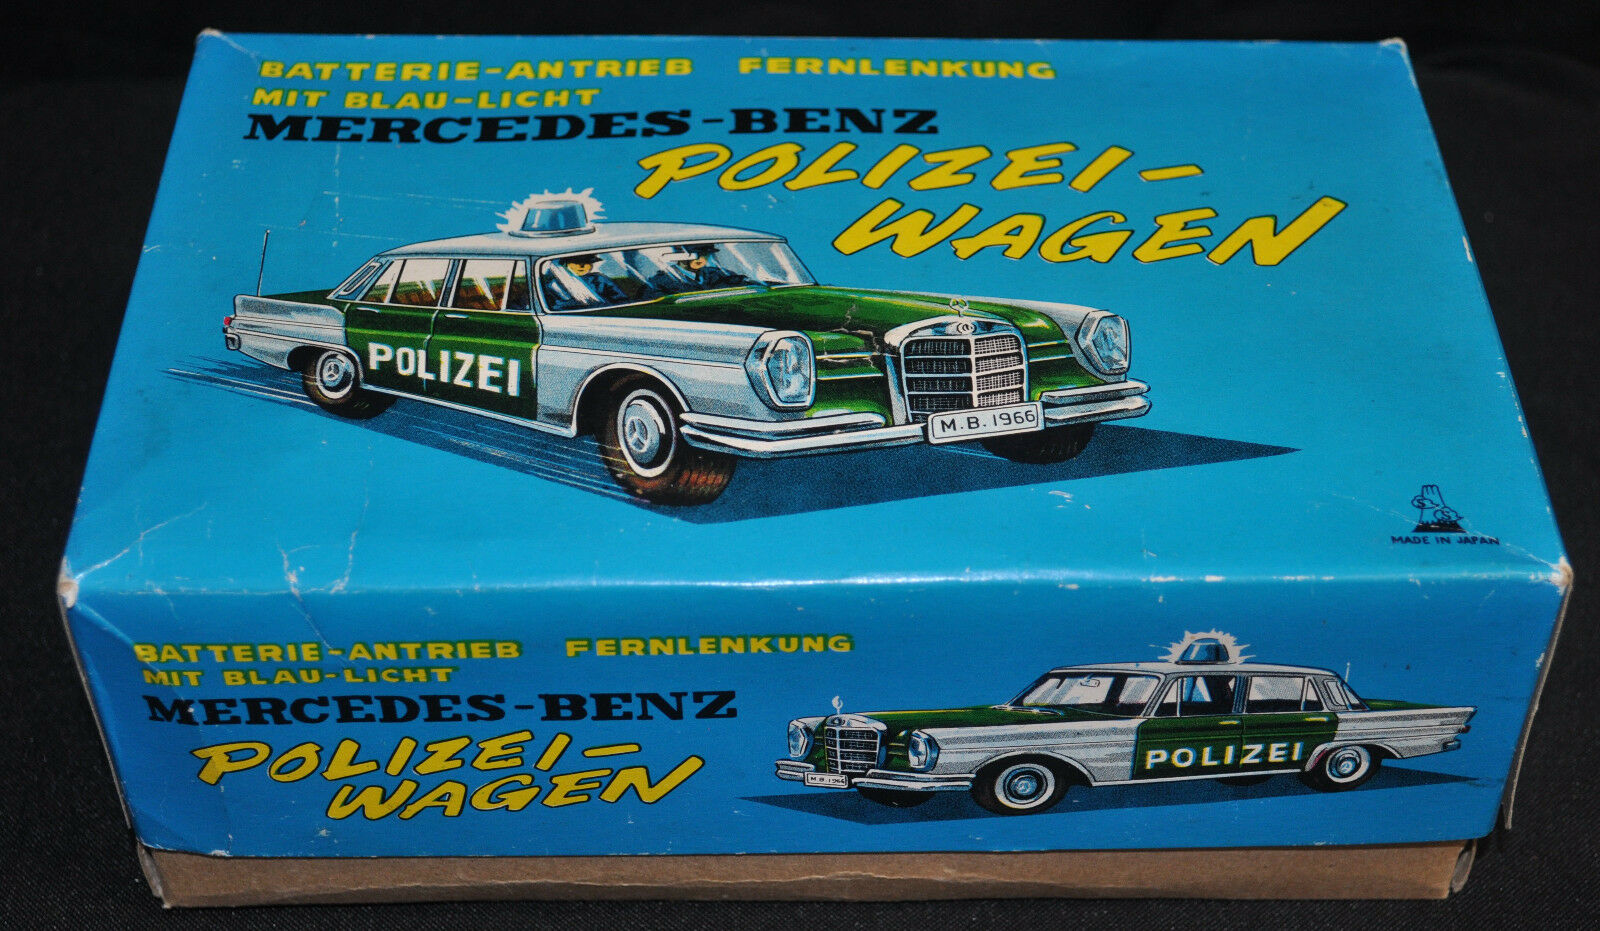 Mercedes Benz Polizei Wagon 6  Batt Op Remote Control Mint in Box (1960s) ITB WH